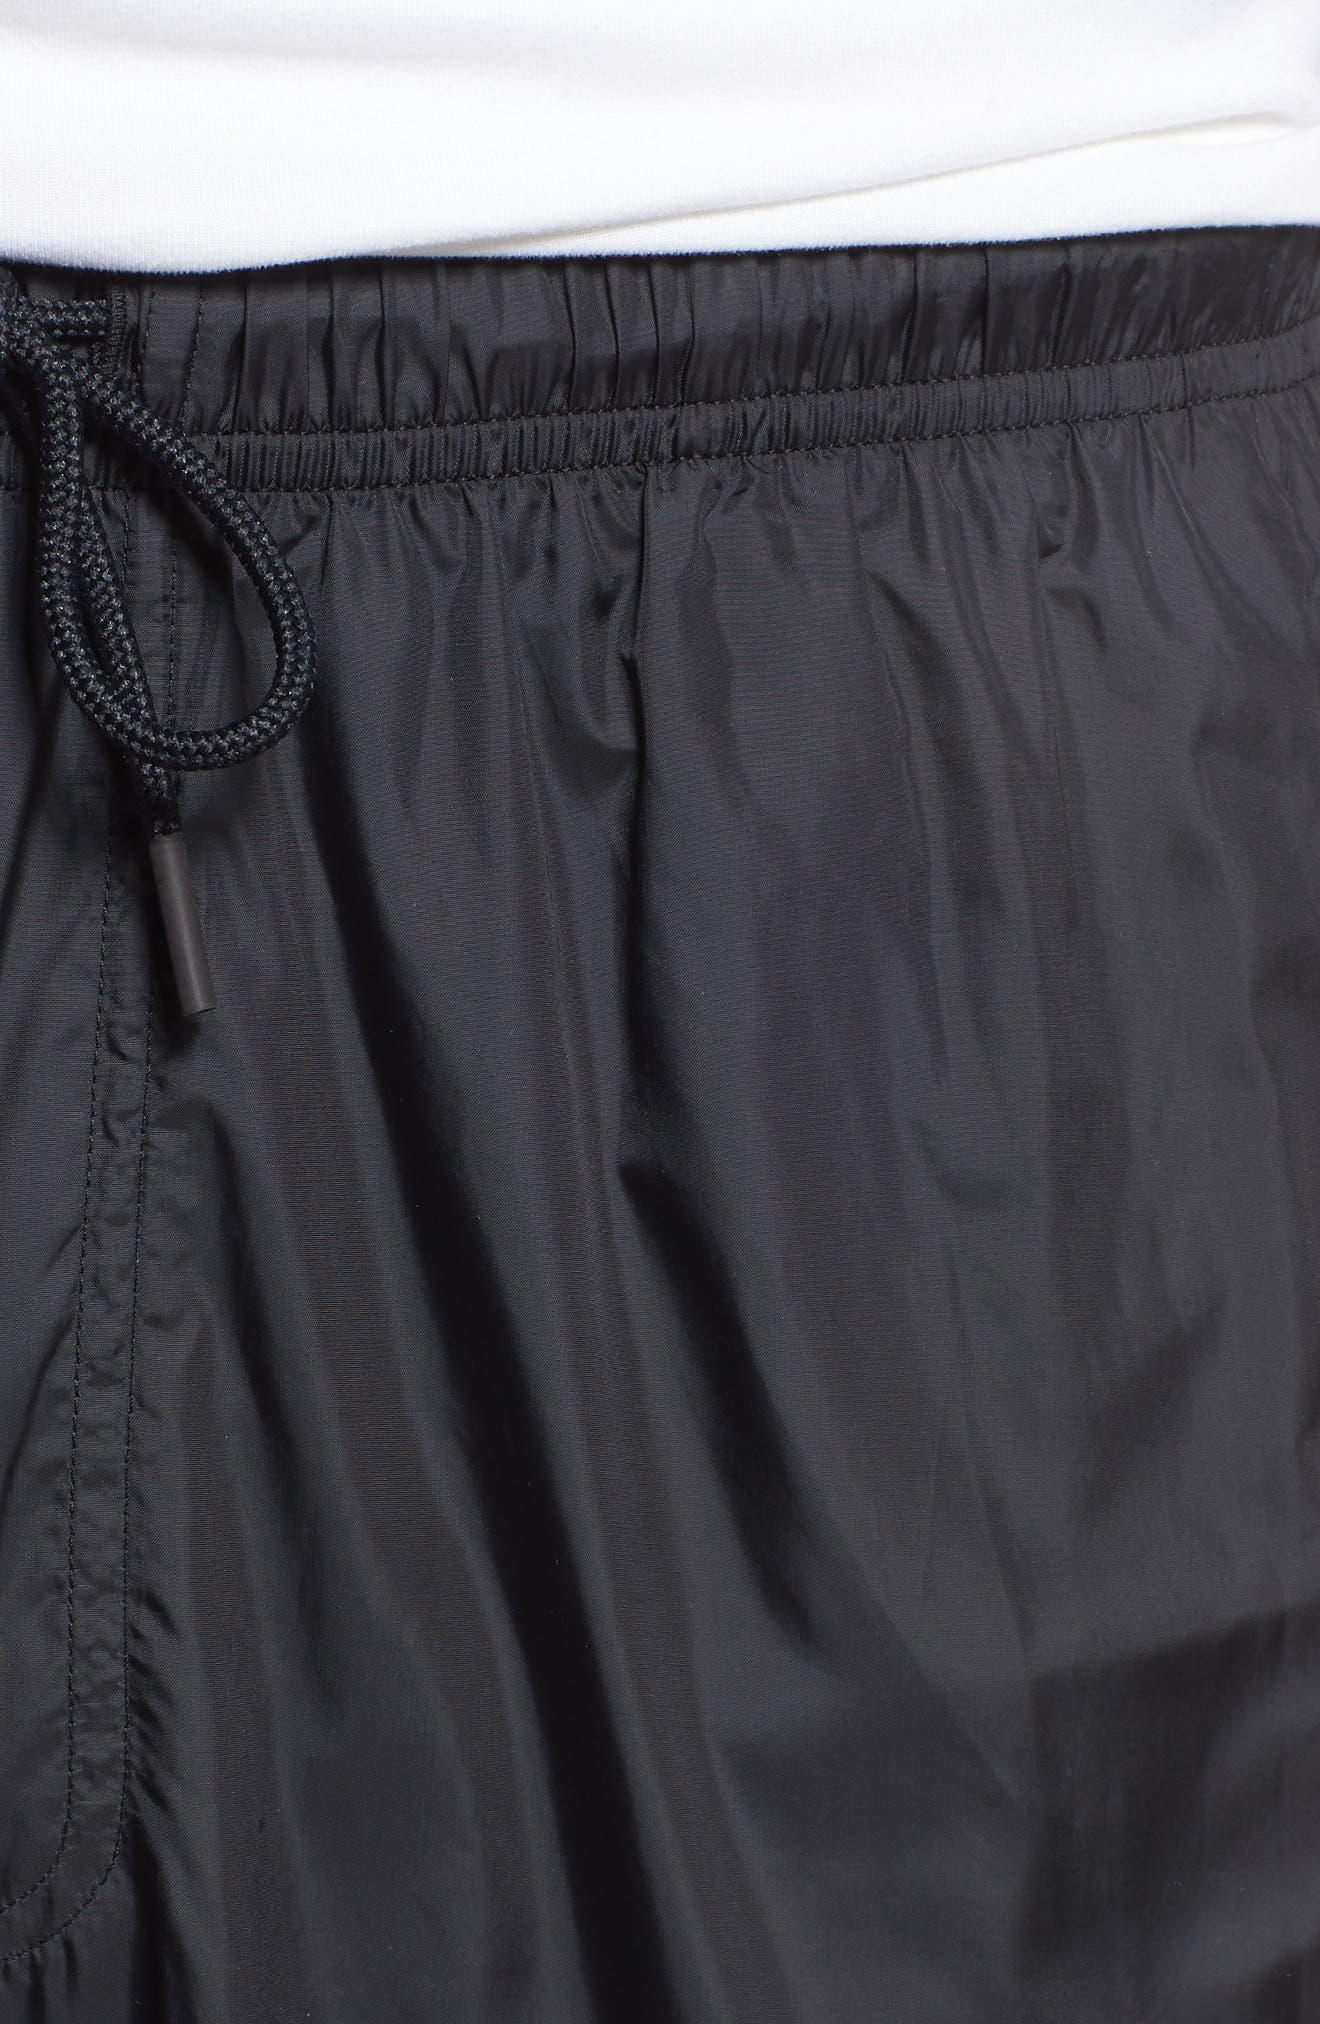 UNDER ARMOUR,                             Sportstyle Wind Pants,                             Alternate thumbnail 4, color,                             BLACK